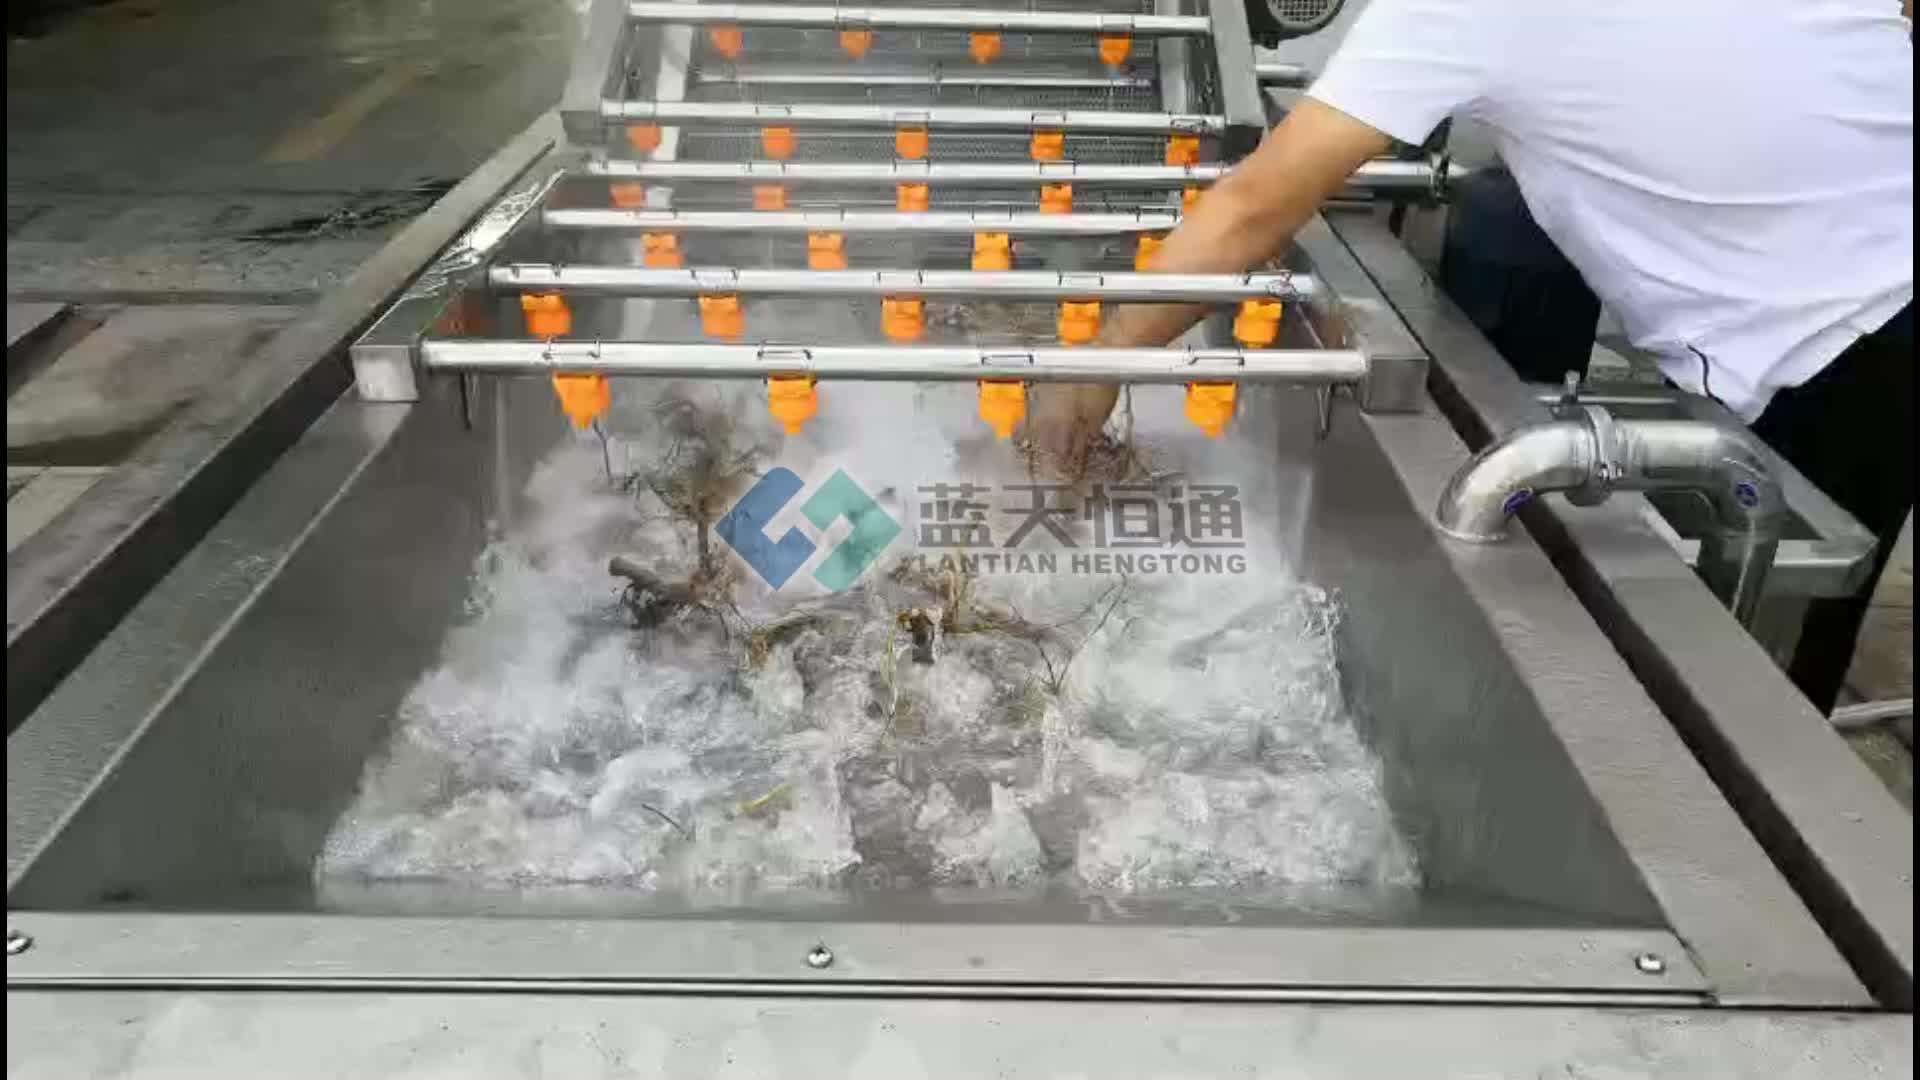 Bolha de ar de girassol máquina de lavar roupa máquina de limpeza de sementes de pêra espinhosa